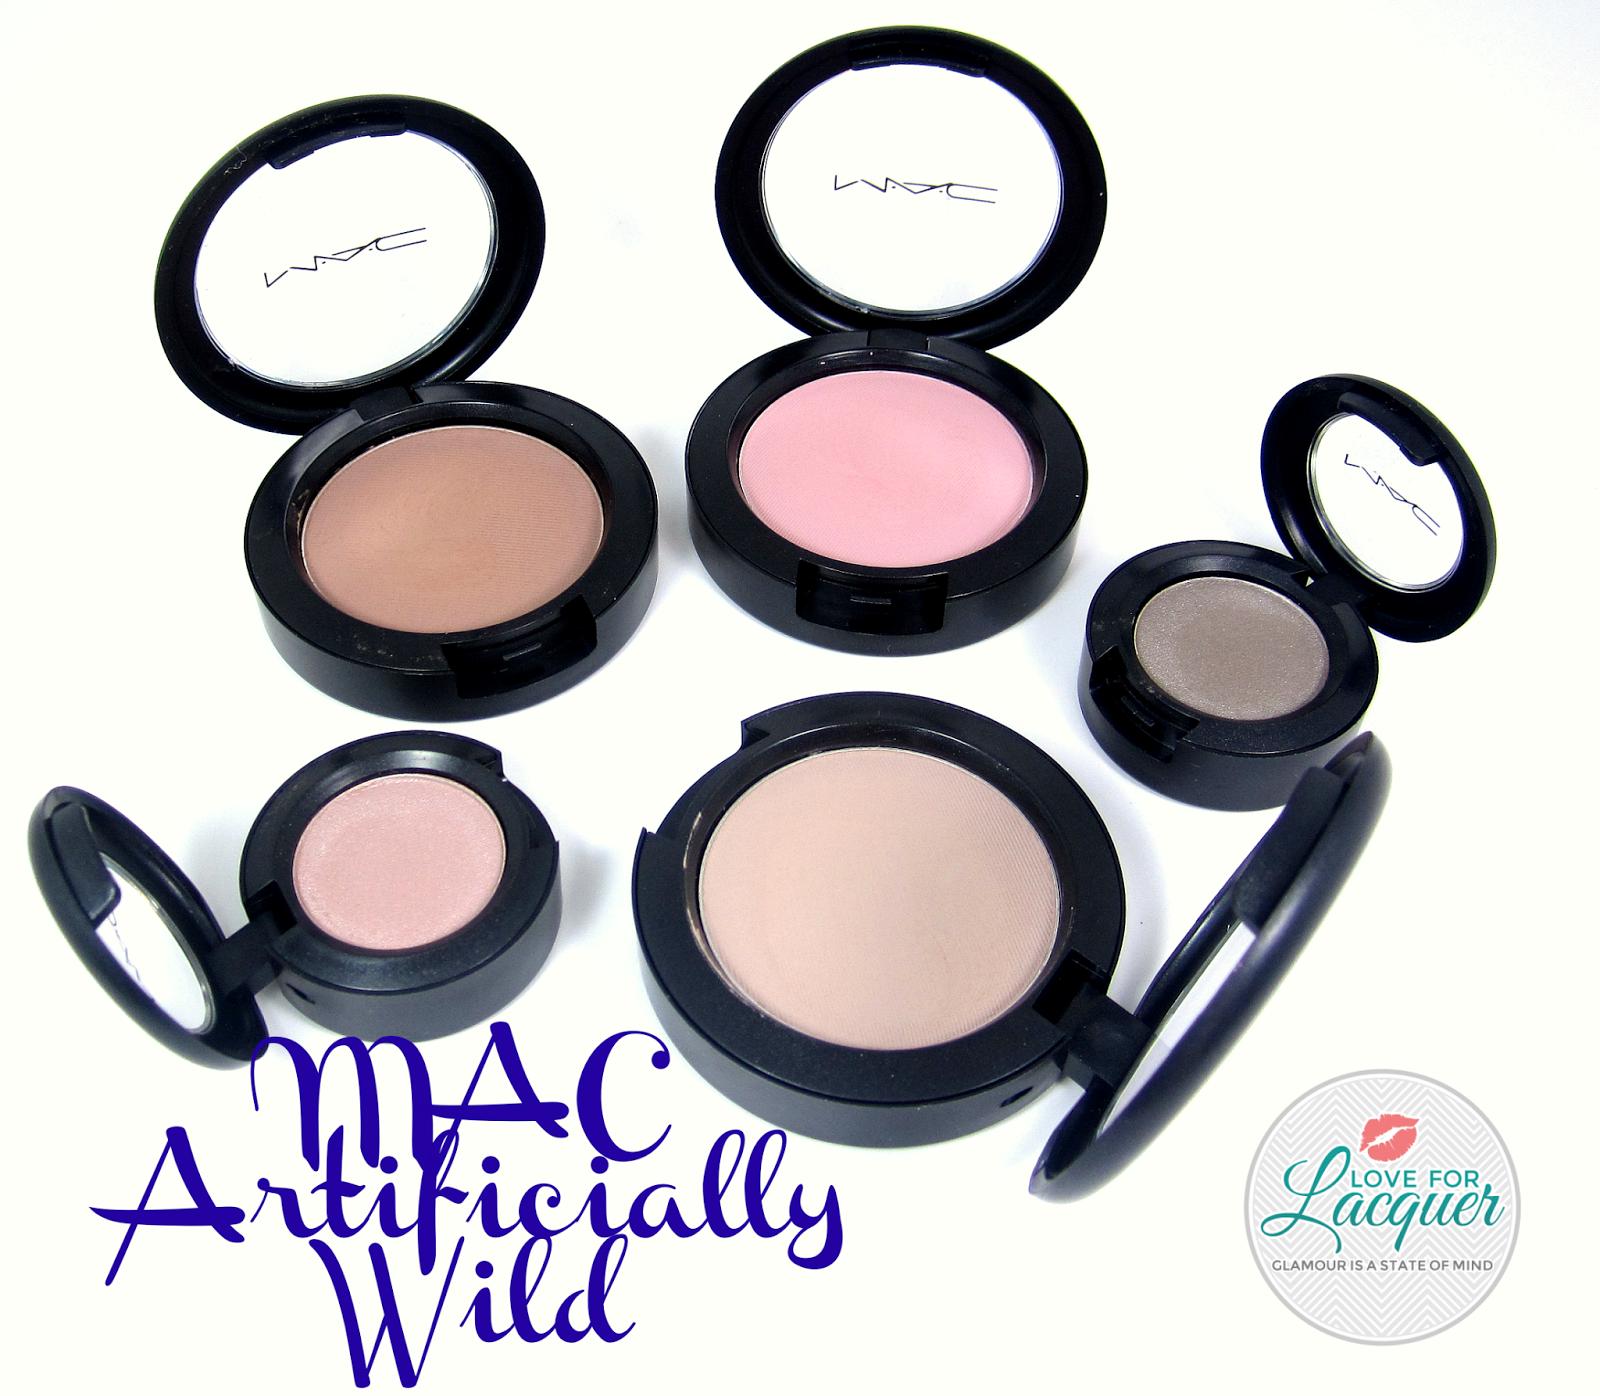 1600x1396 Mac Artificially Wild Collection Blushes Amp Eyeshadows